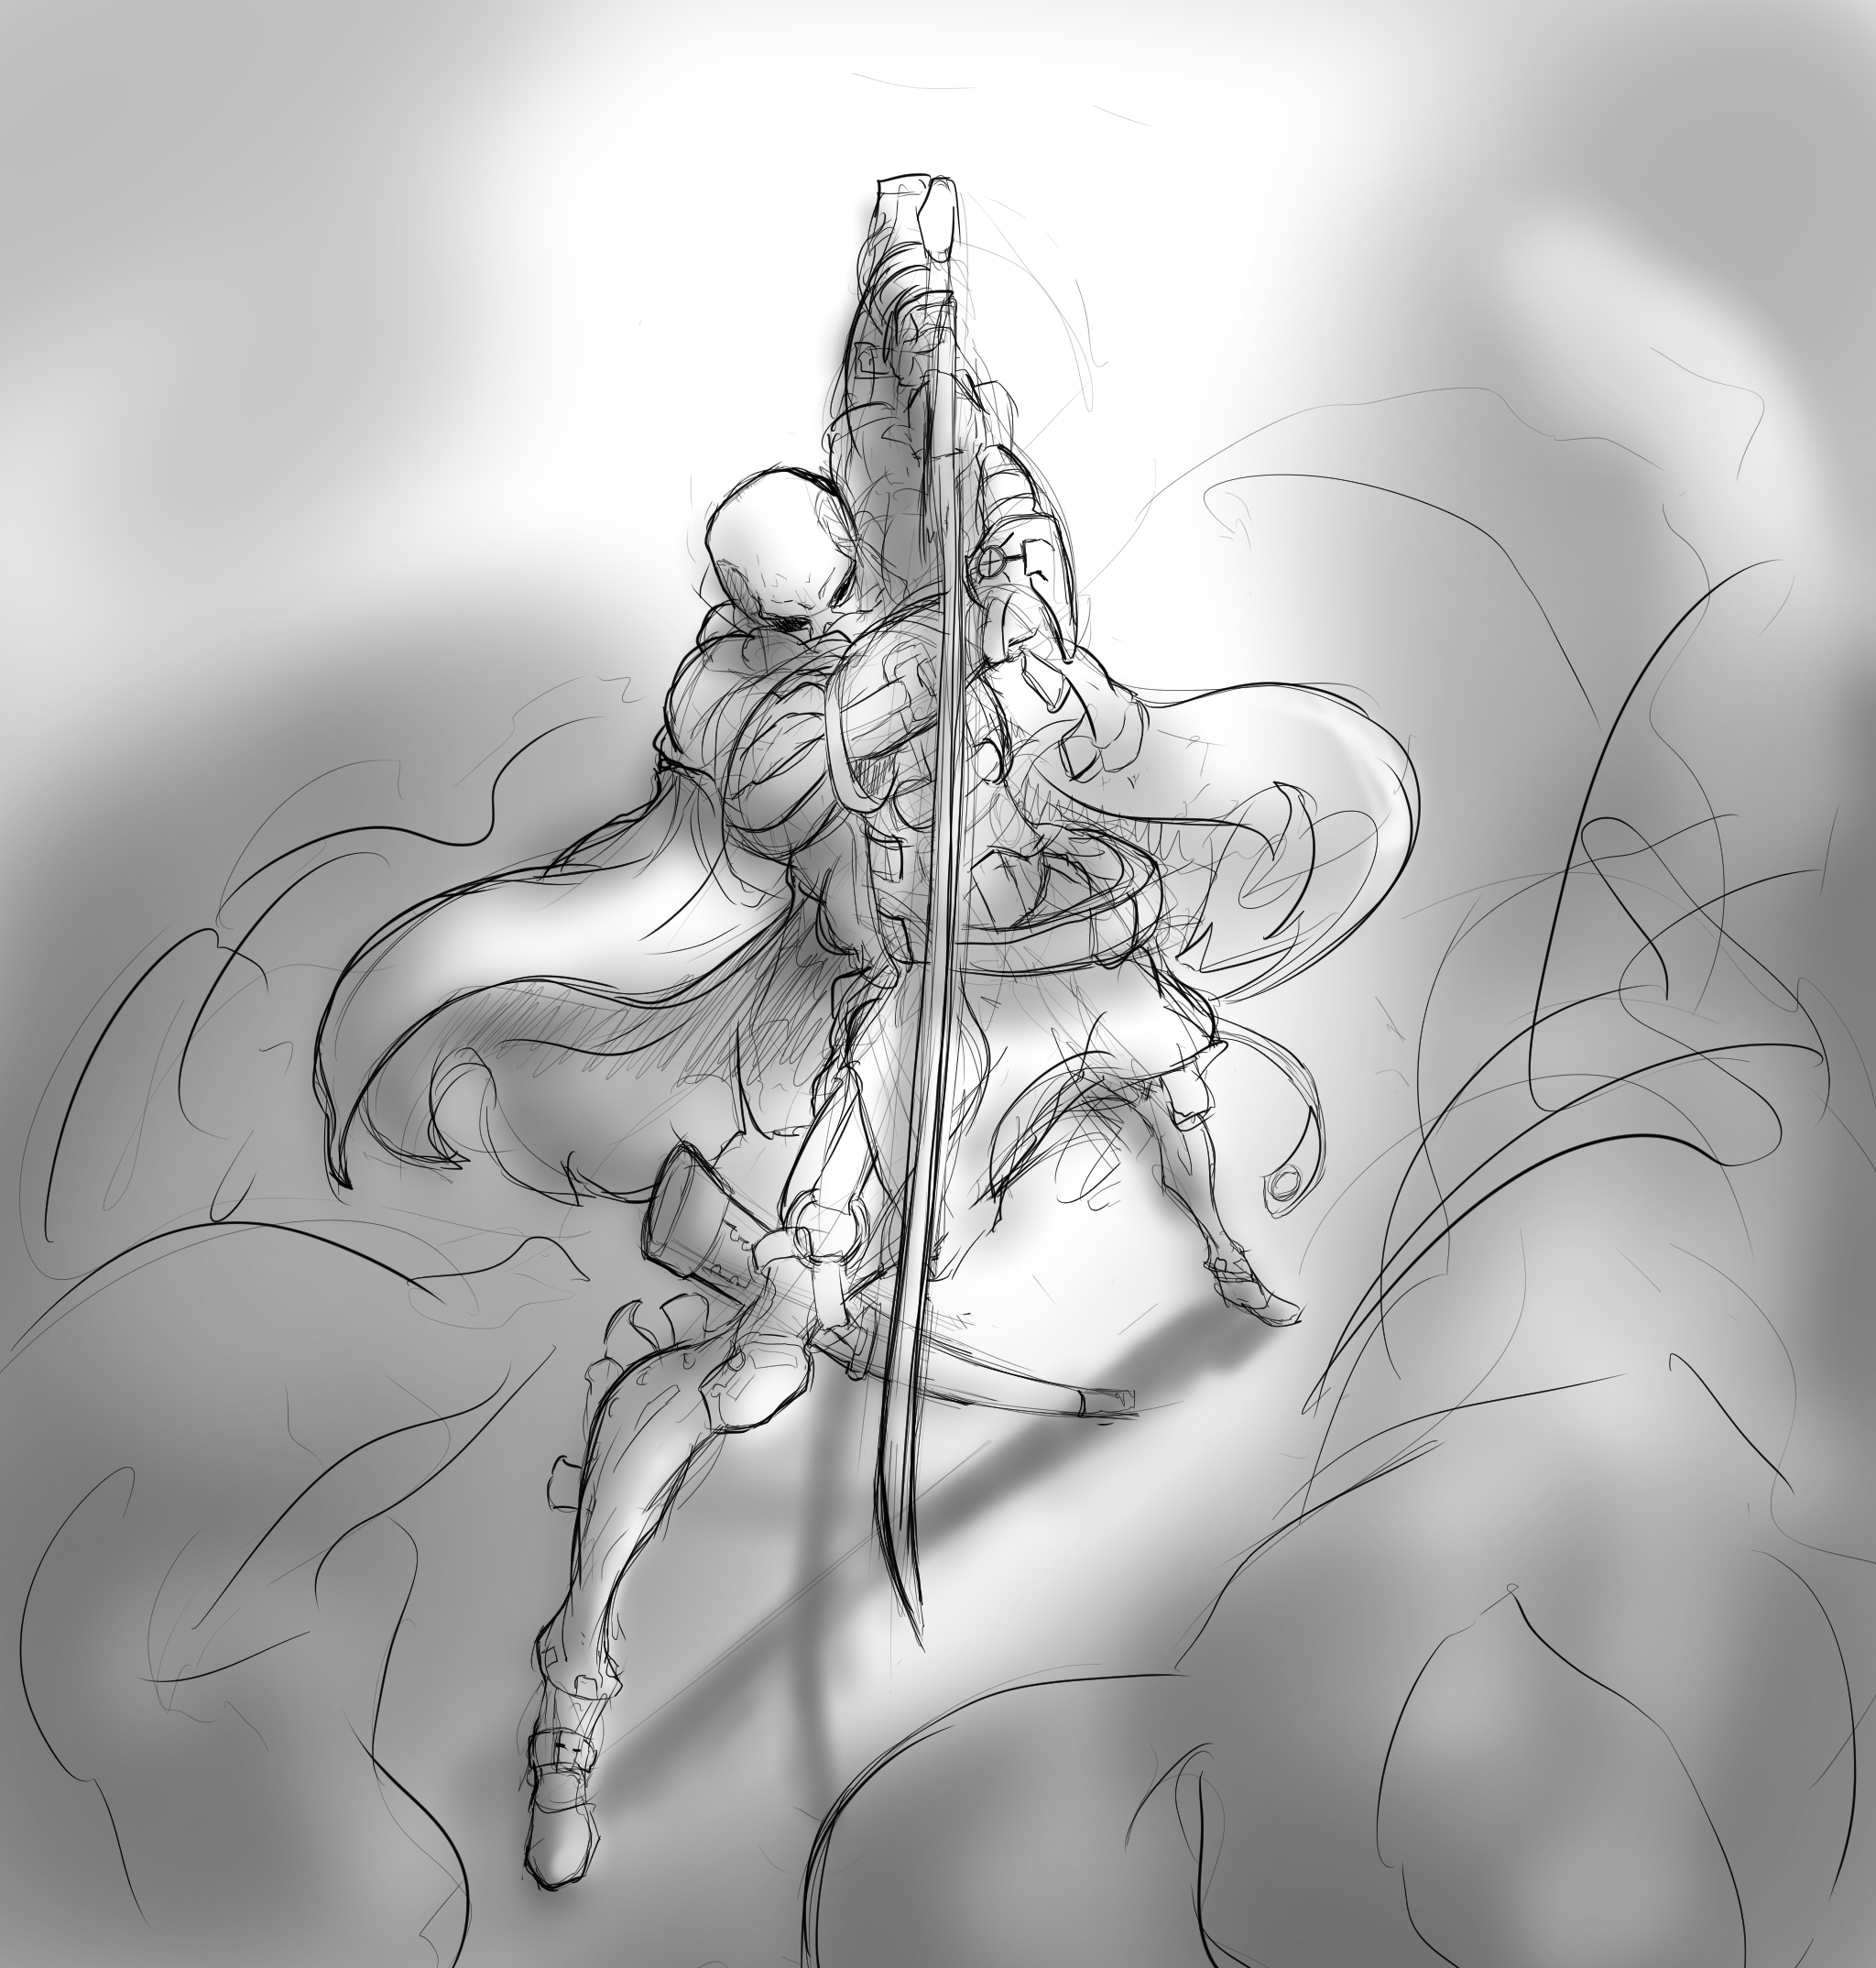 Sword guy the GUY!